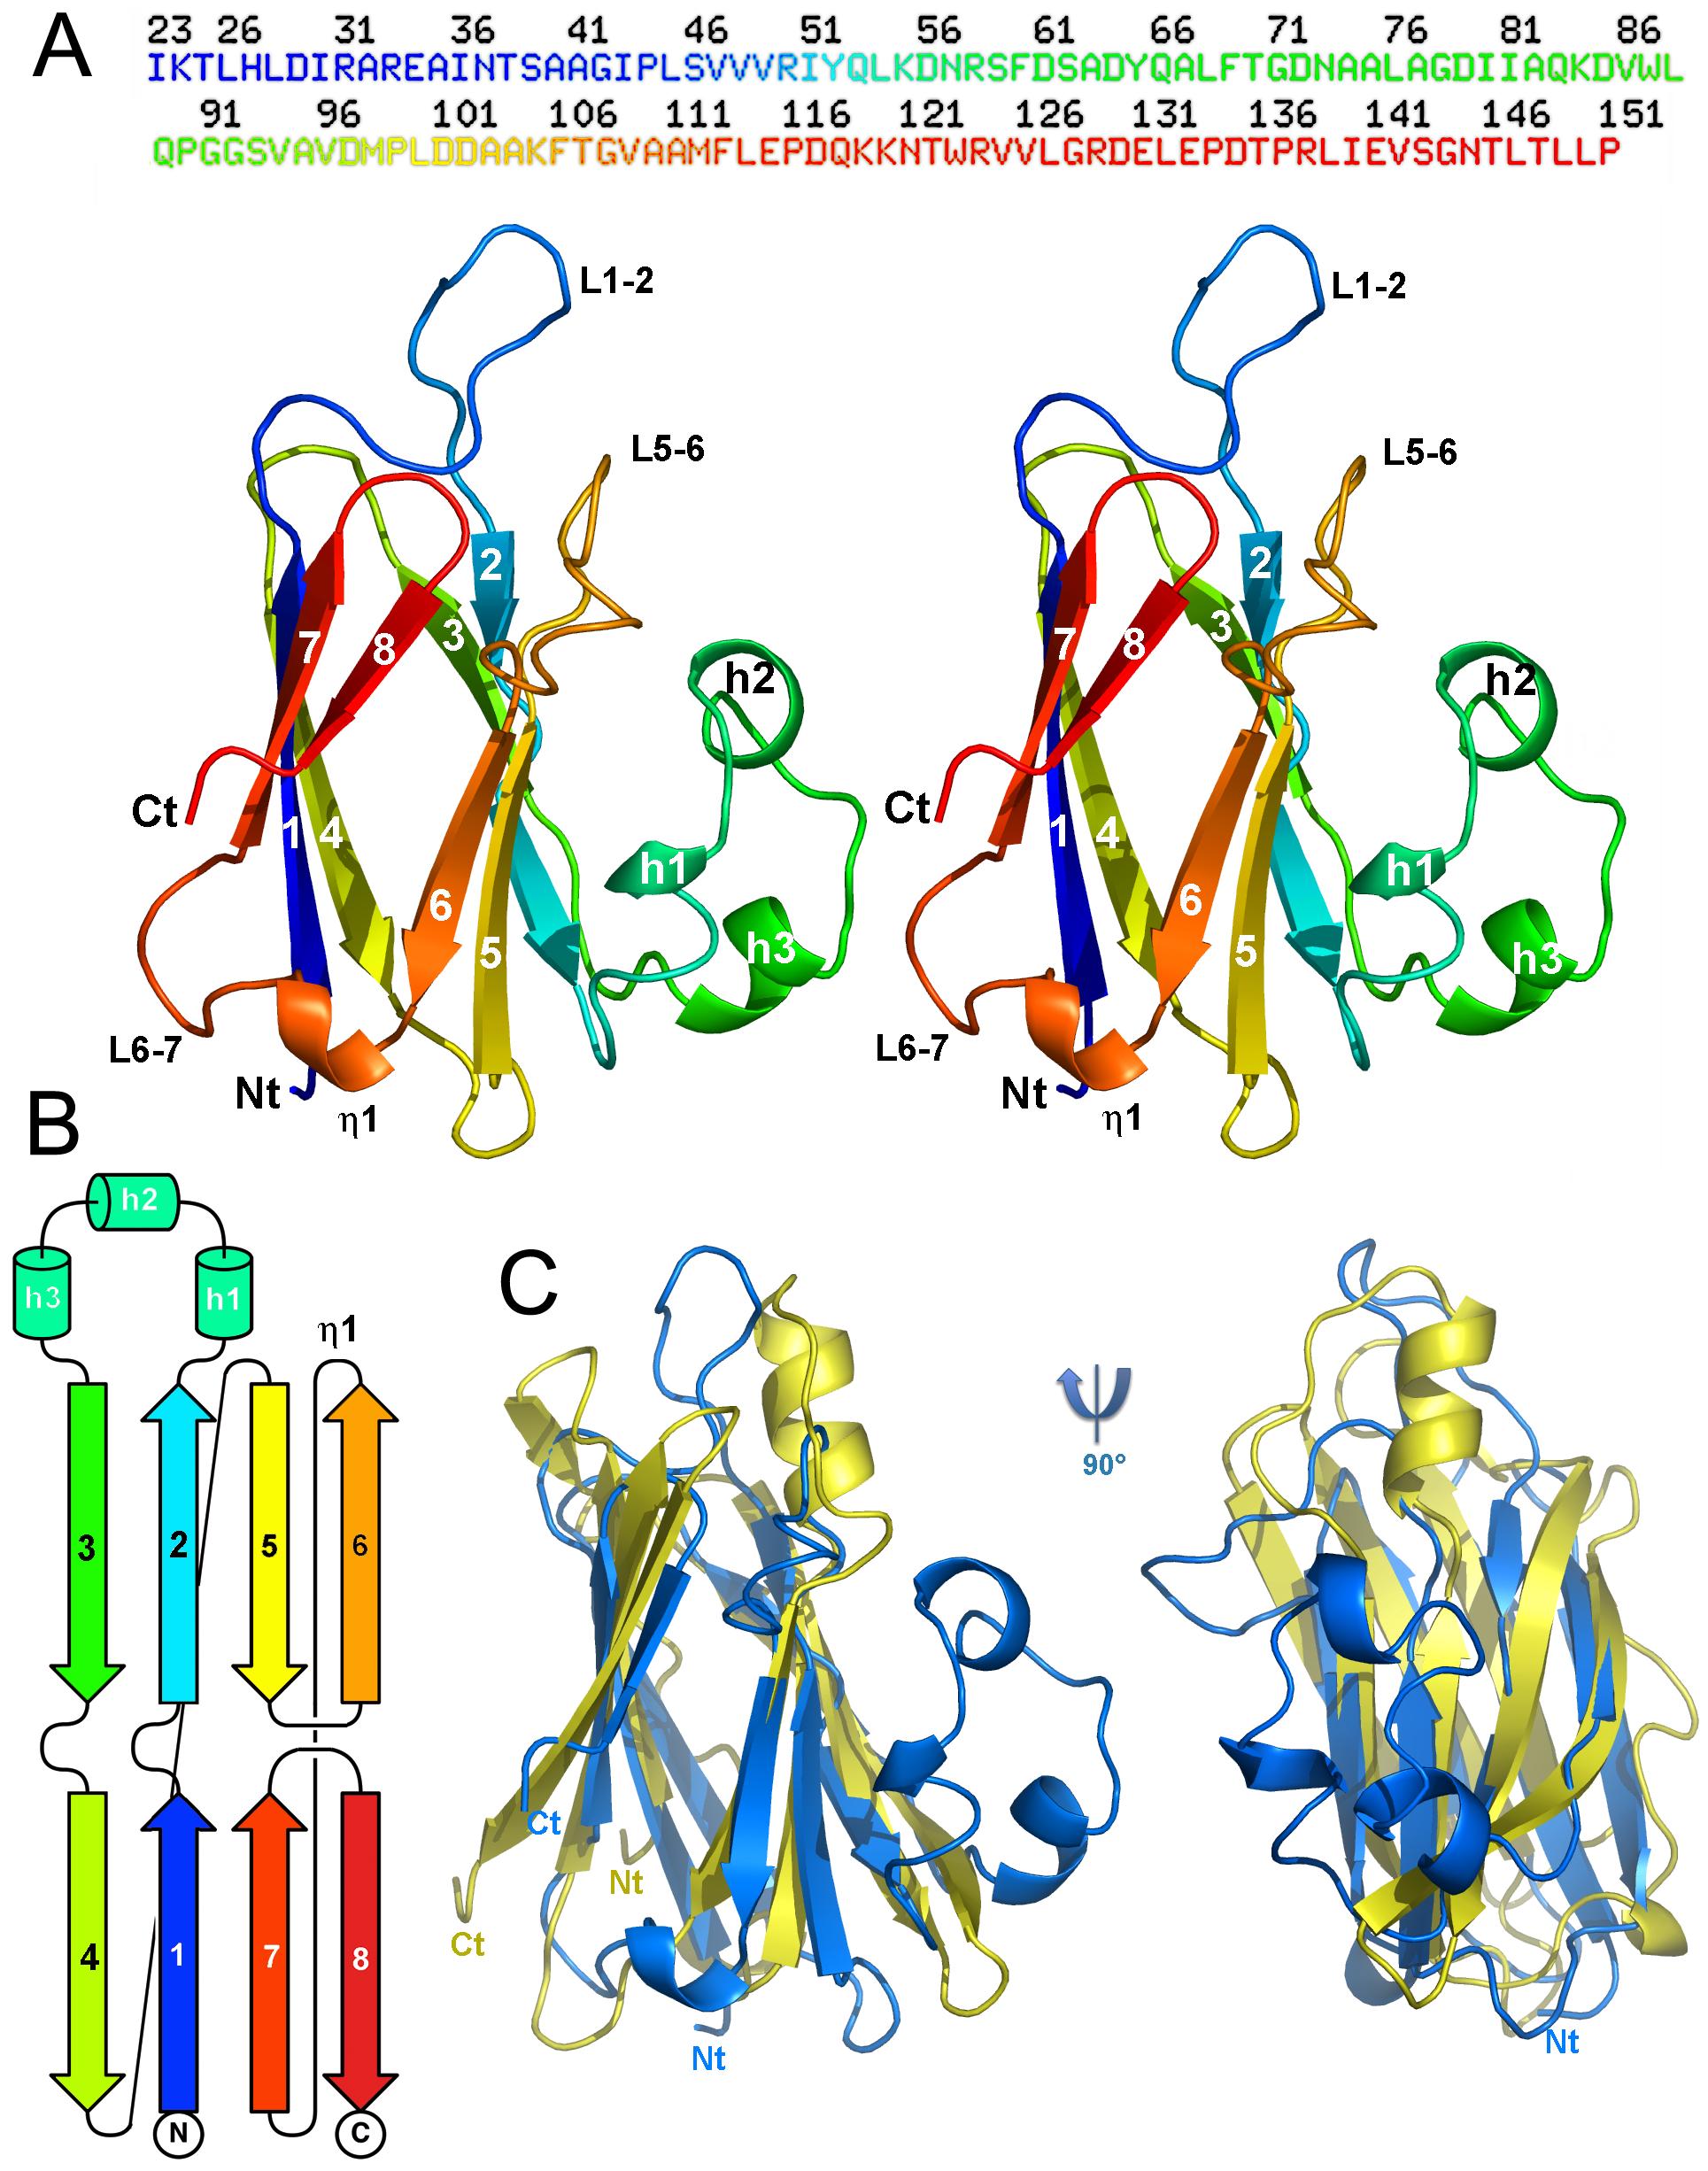 Structure of the enteroaggregative <i>E. coli</i> T6SS TssJ subunit.